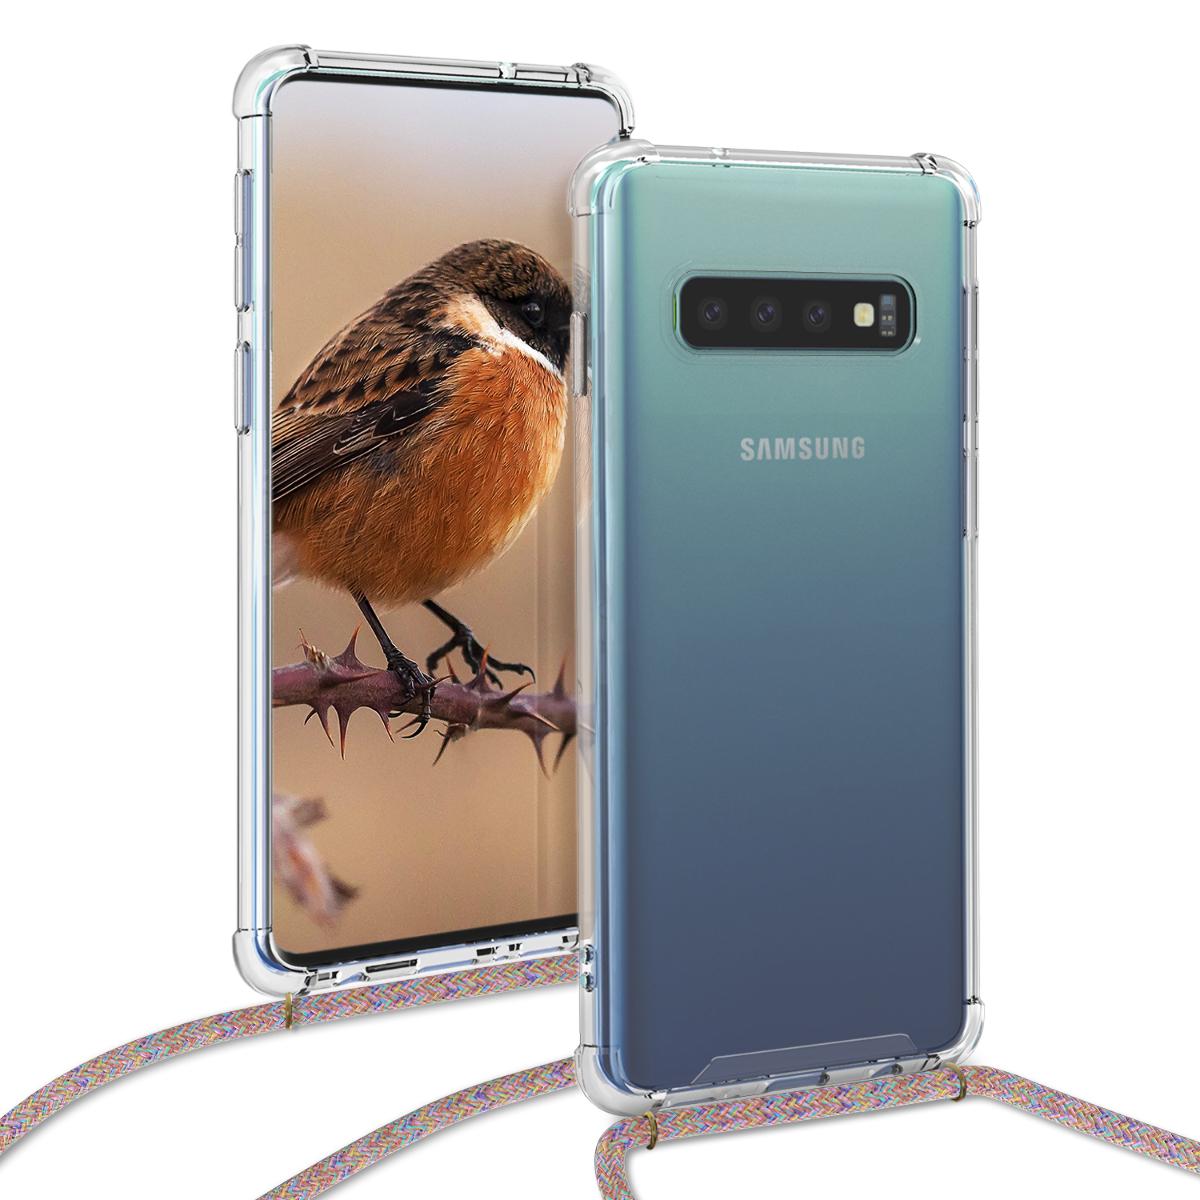 KW Θήκη Σιλικόνης με Λουράκι Samsung Galaxy S10 - Transparent (48163.32)